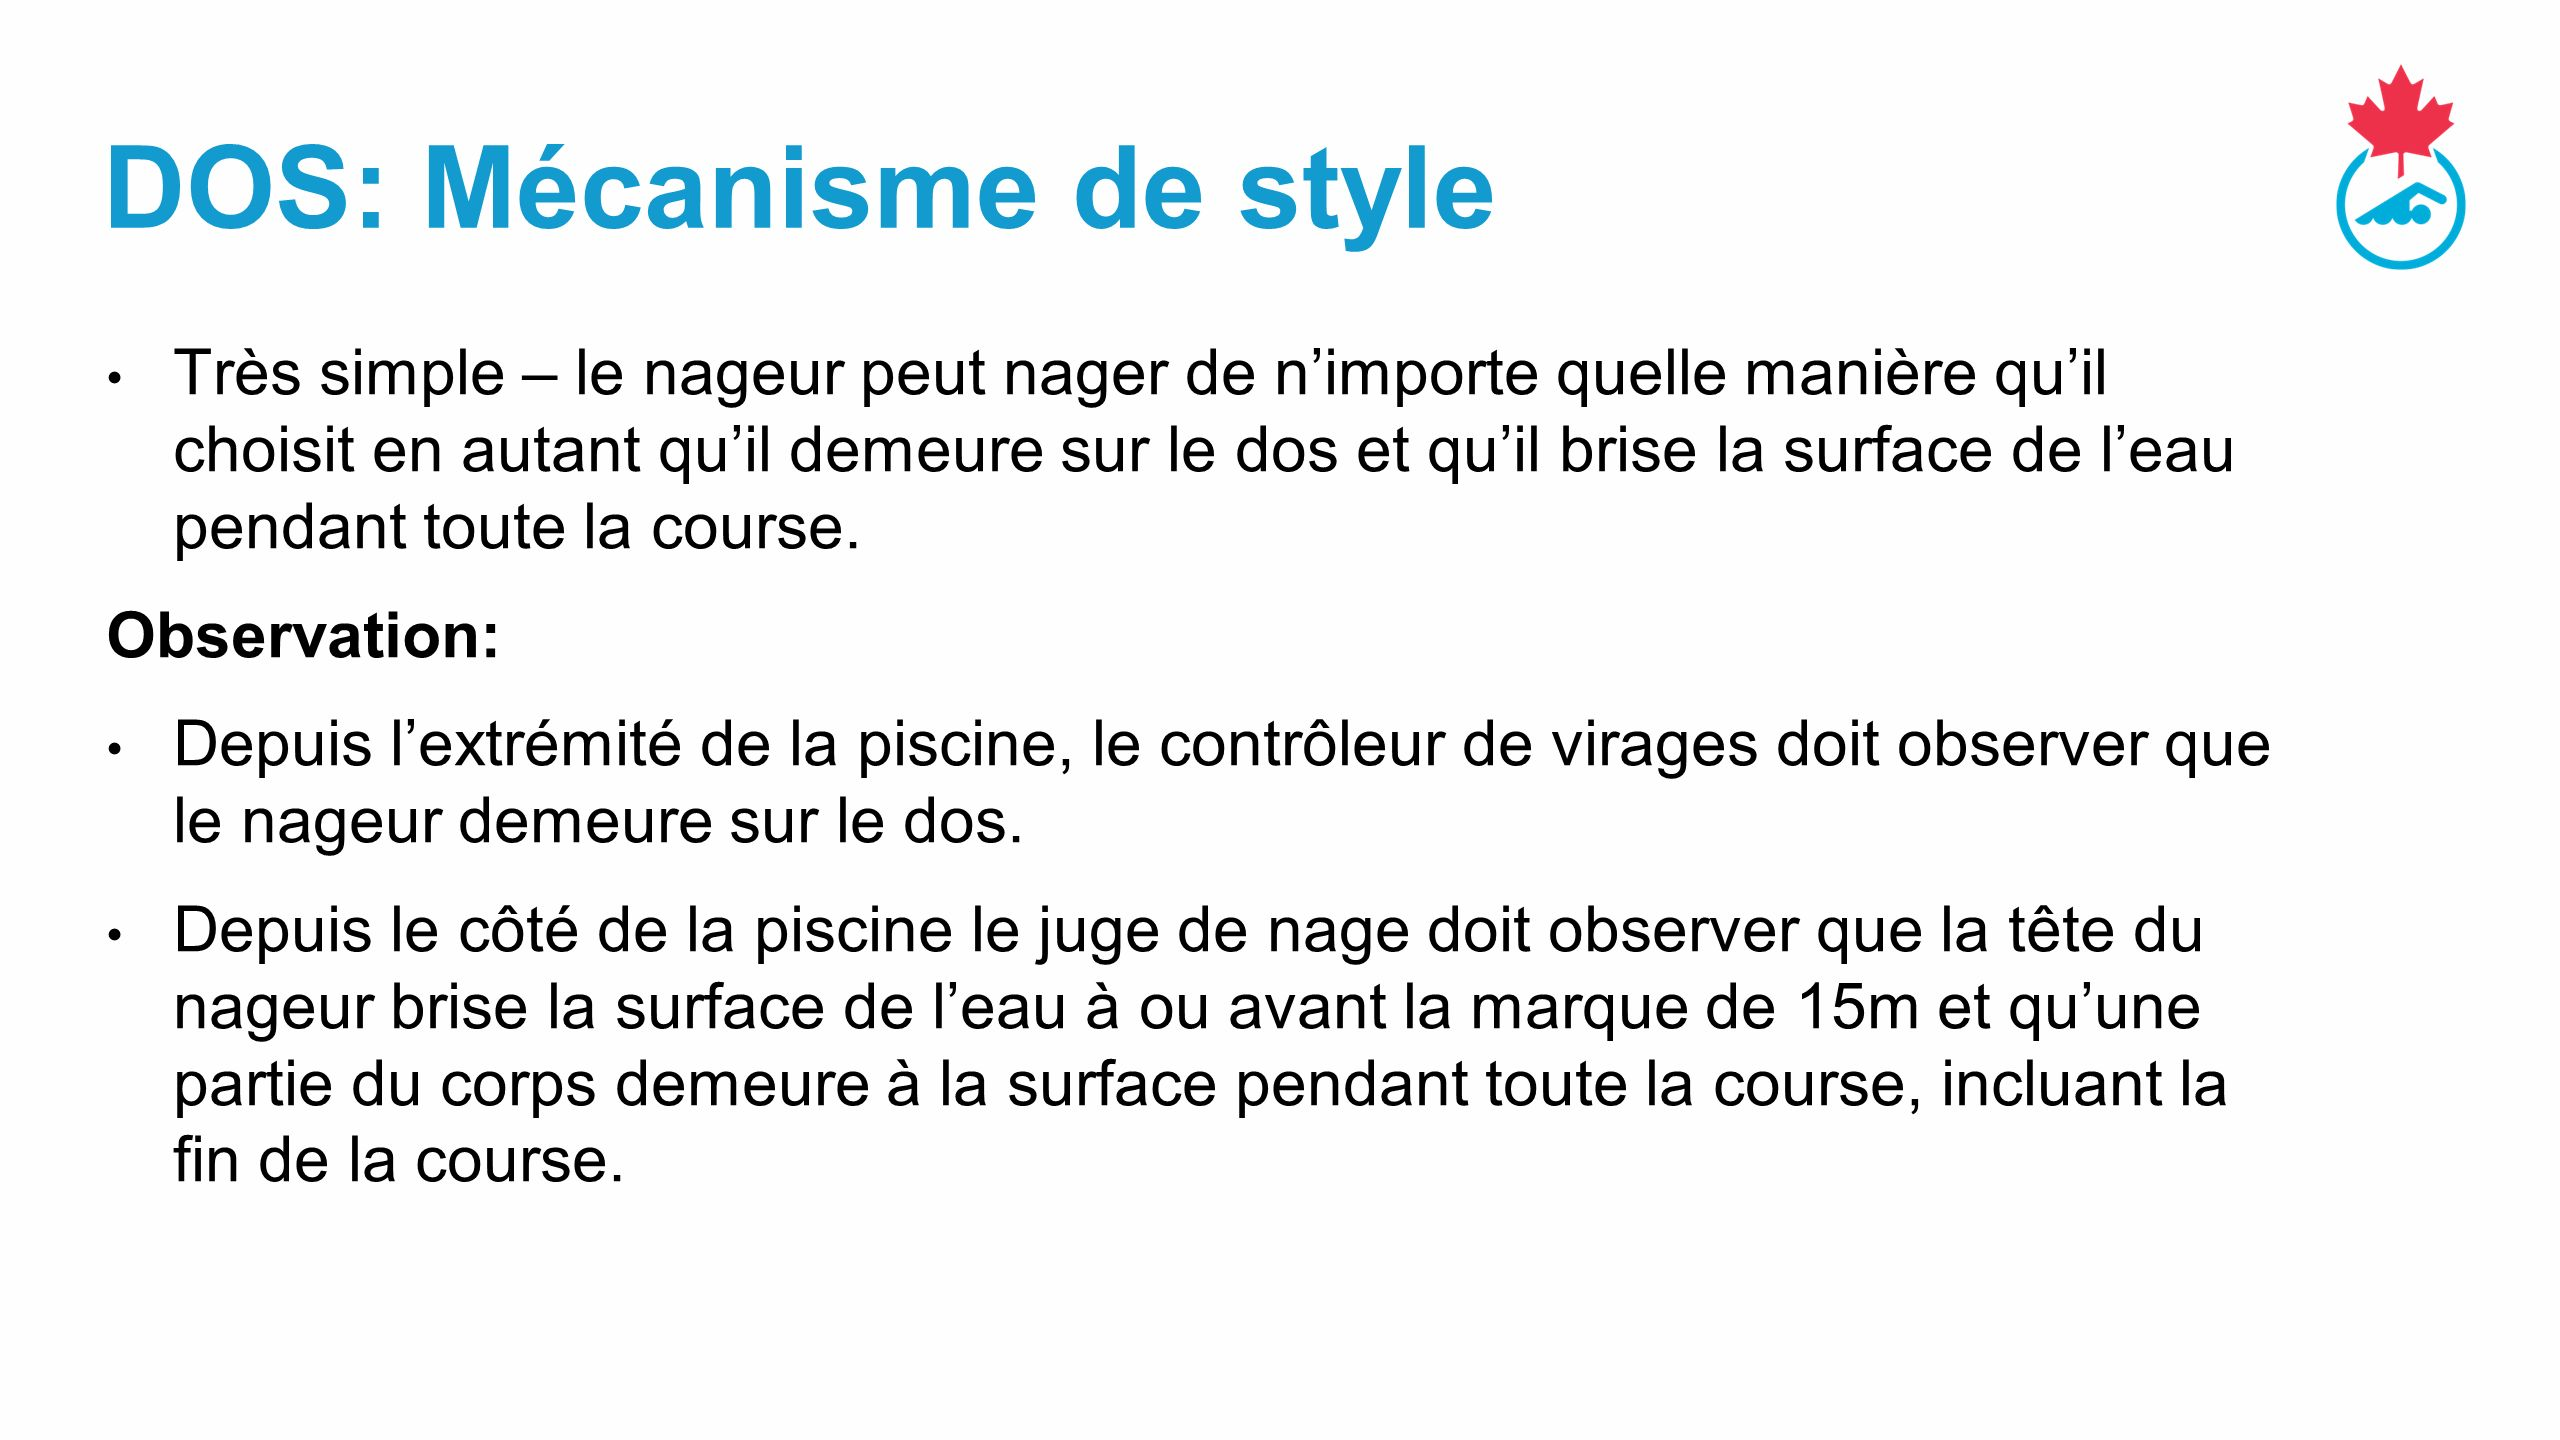 DOS: Mécanisme de style